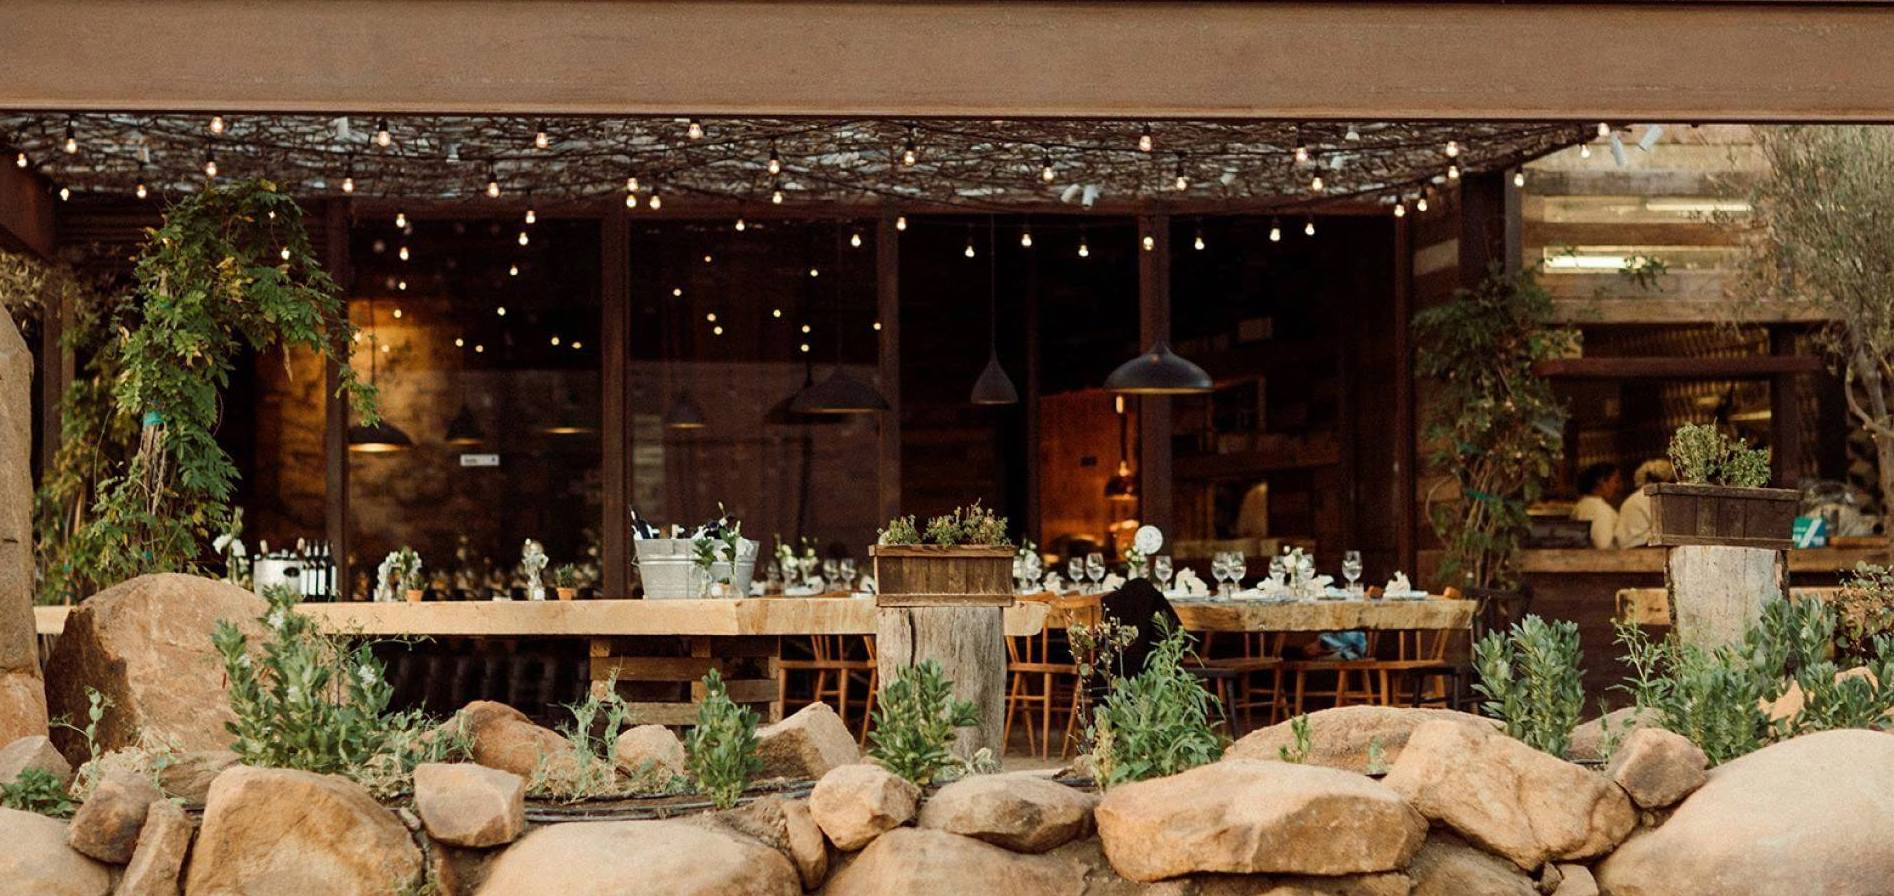 Fauna restaurante Latin America's 50 Best Restaurants